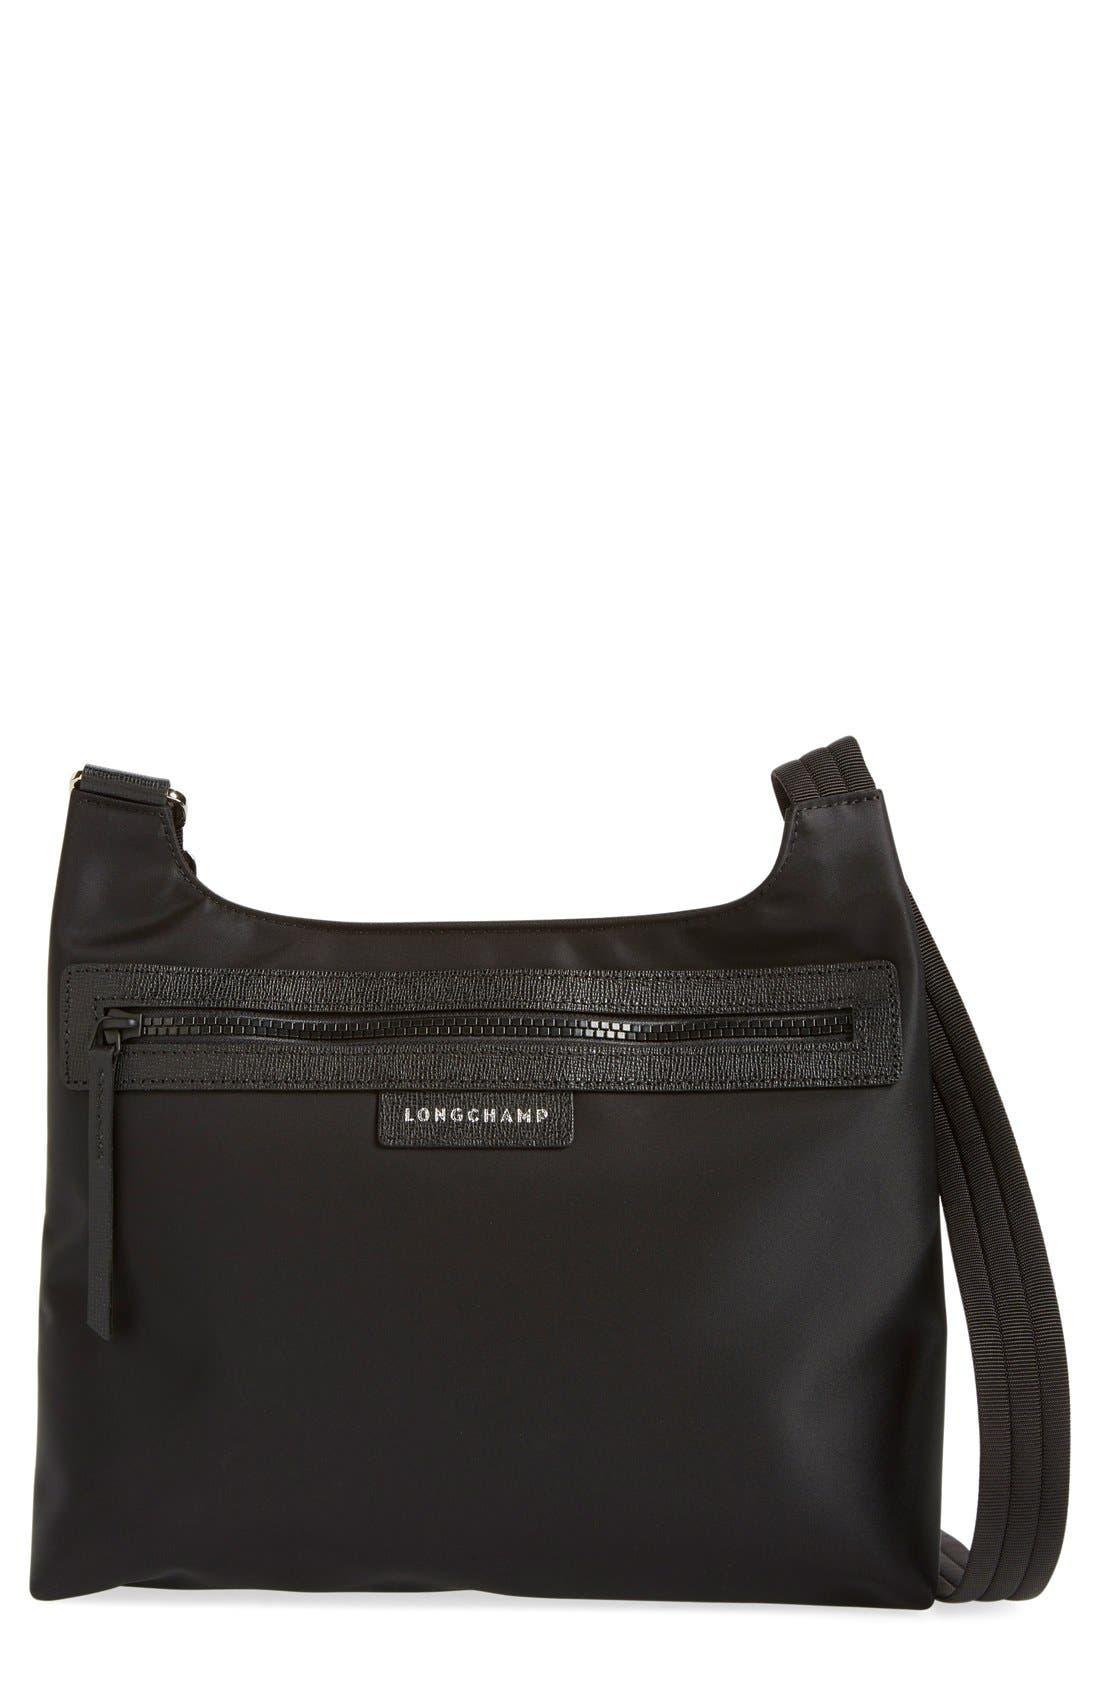 'Le Pliage Neo' Nylon Crossbody Bag,                             Main thumbnail 1, color,                             BLACK